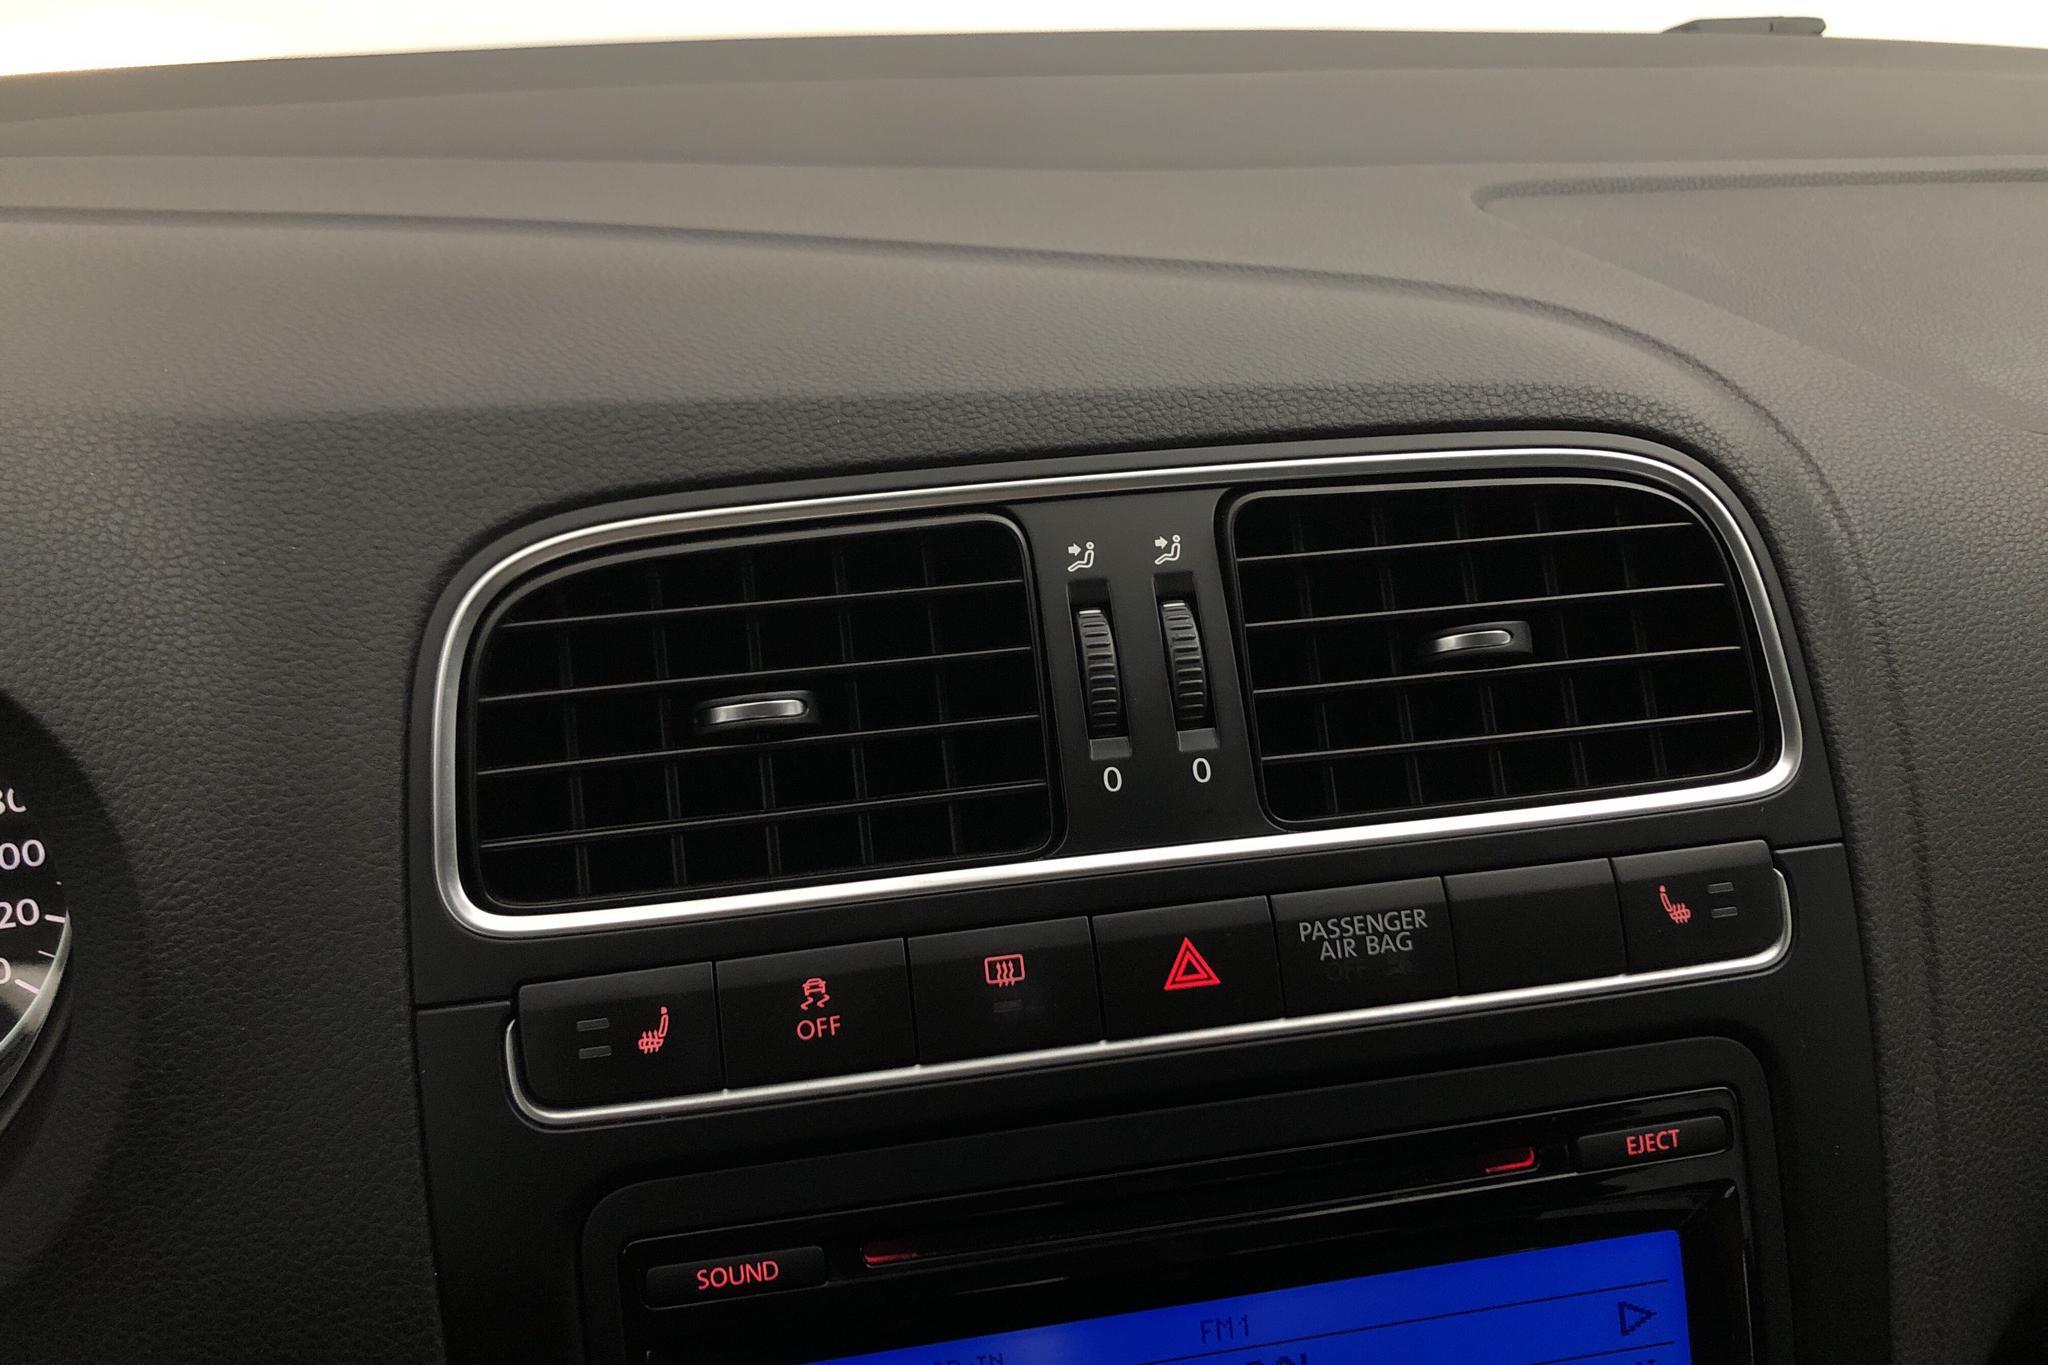 VW Polo 1.4 5dr (85hk) - 6 790 mil - Manuell - silver - 2010